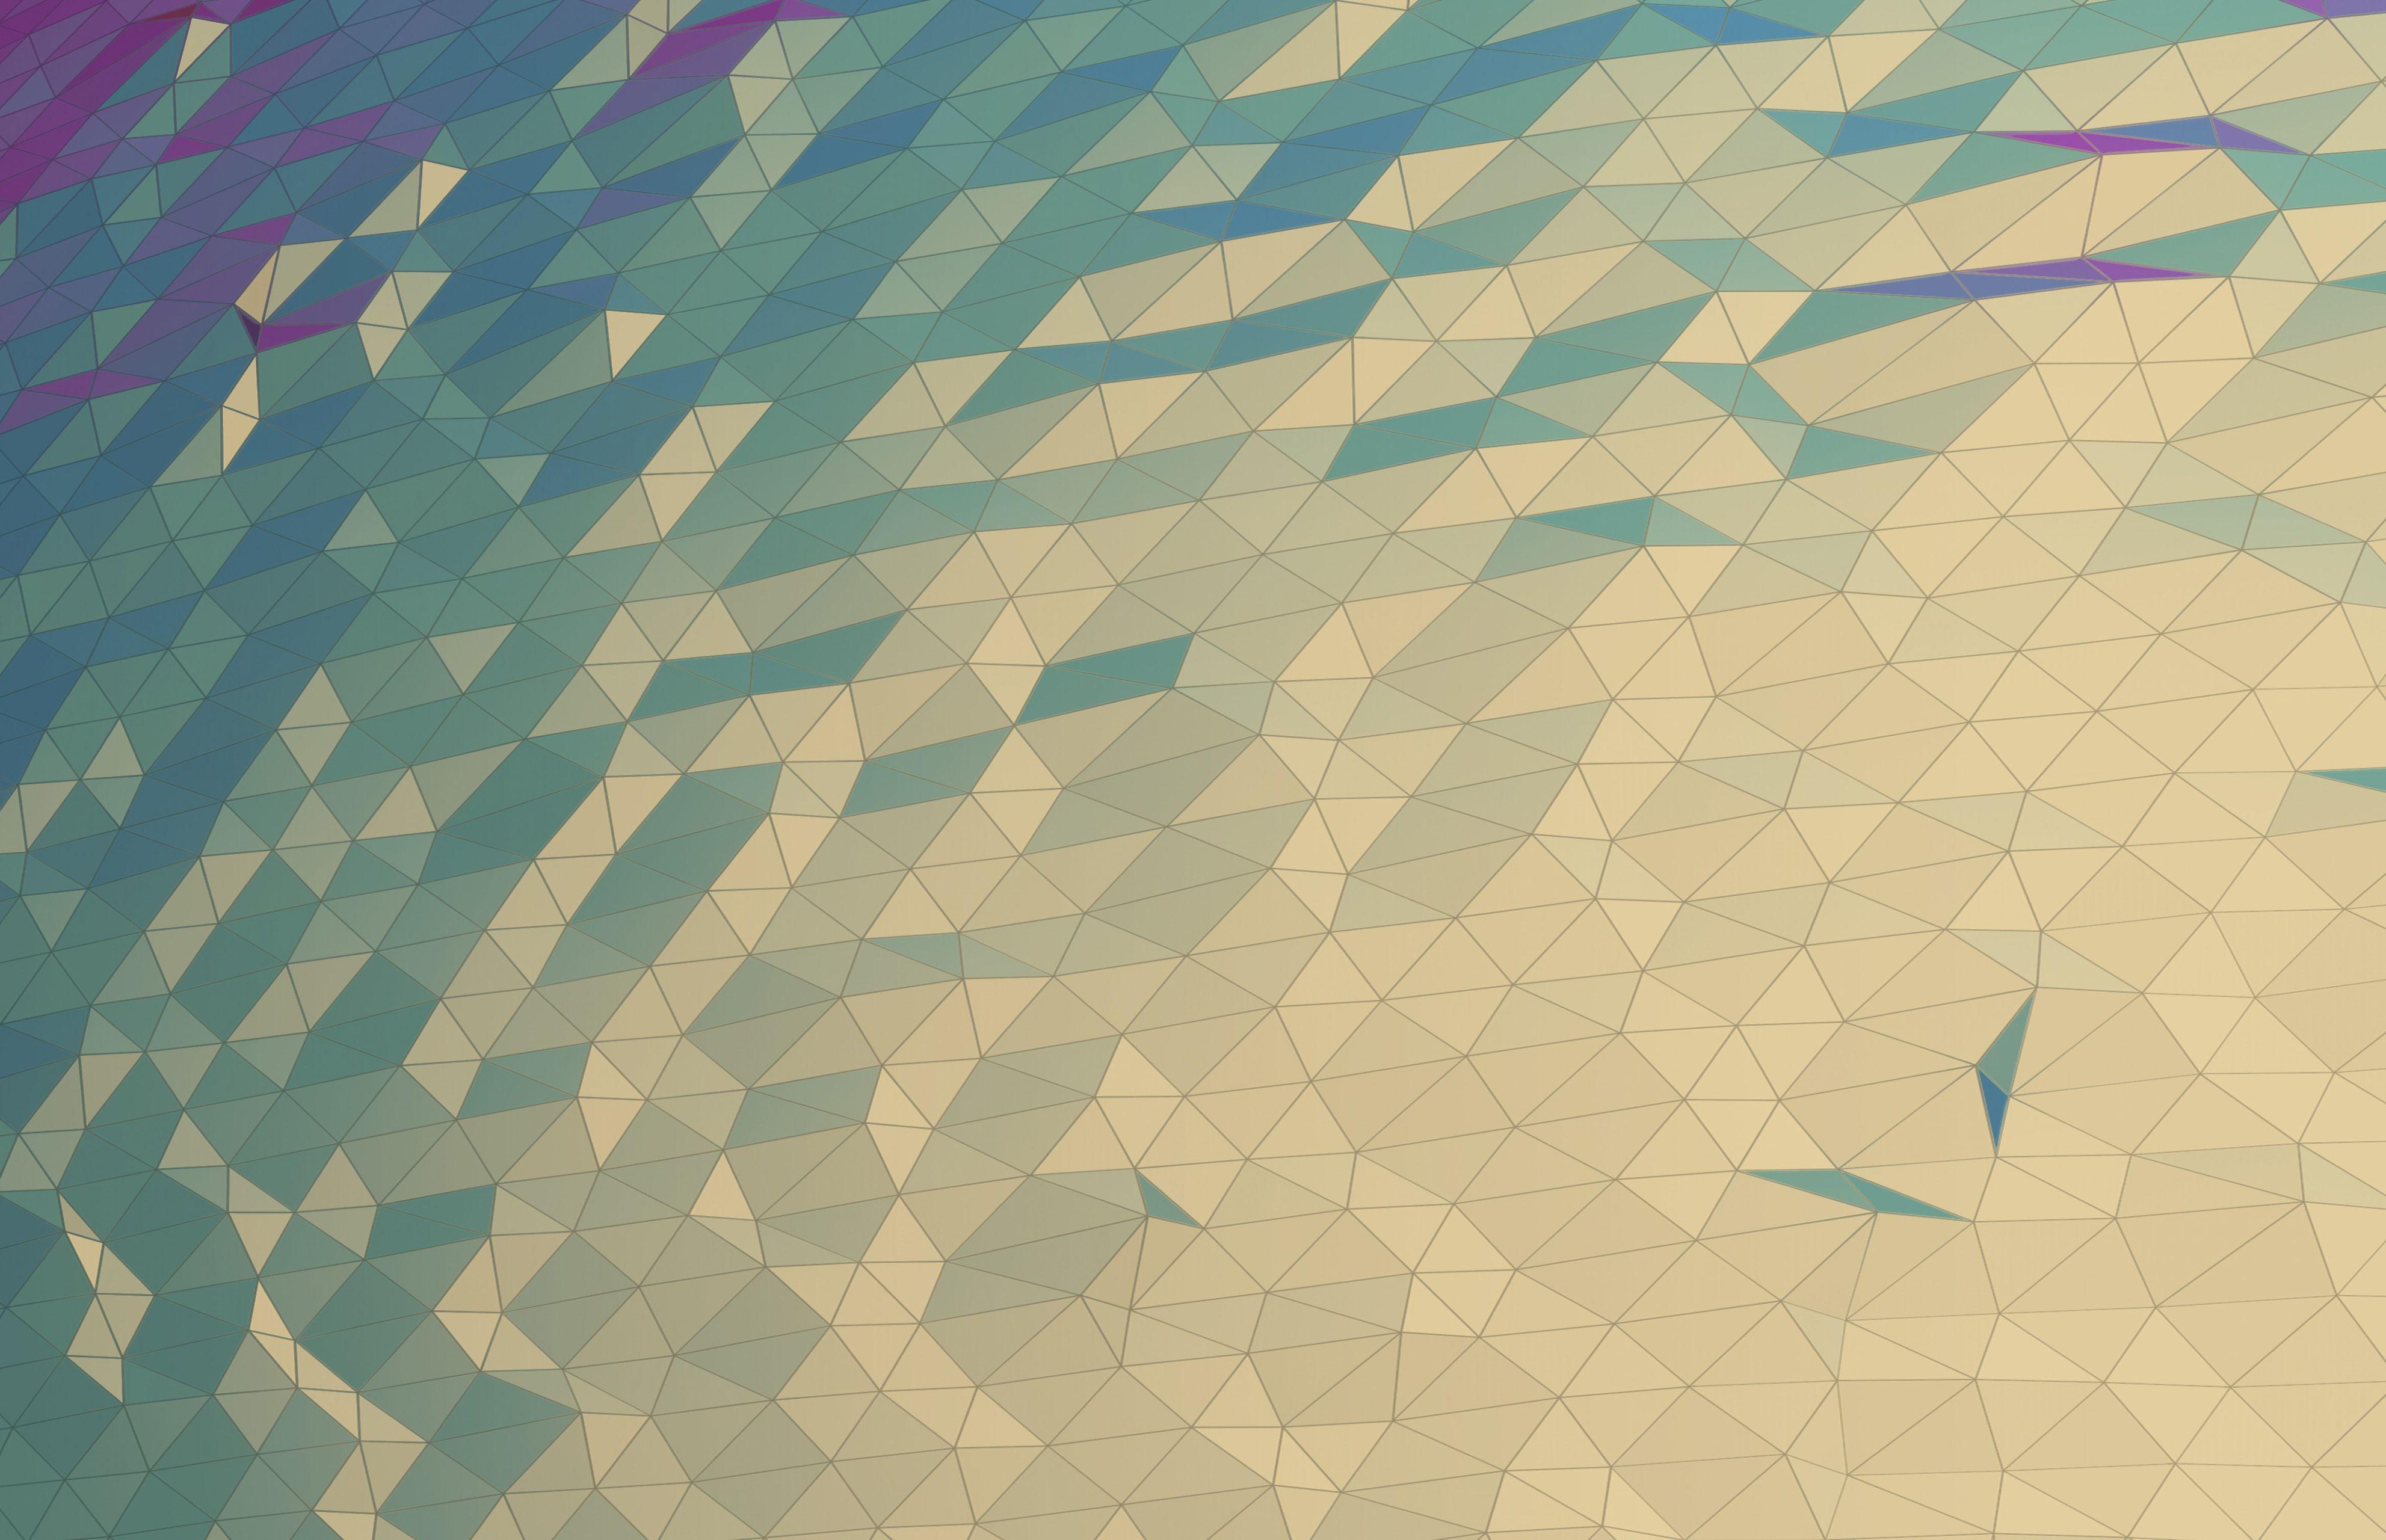 aqua watermelon wallpaper abstract wallpapers wallpapers for desktop